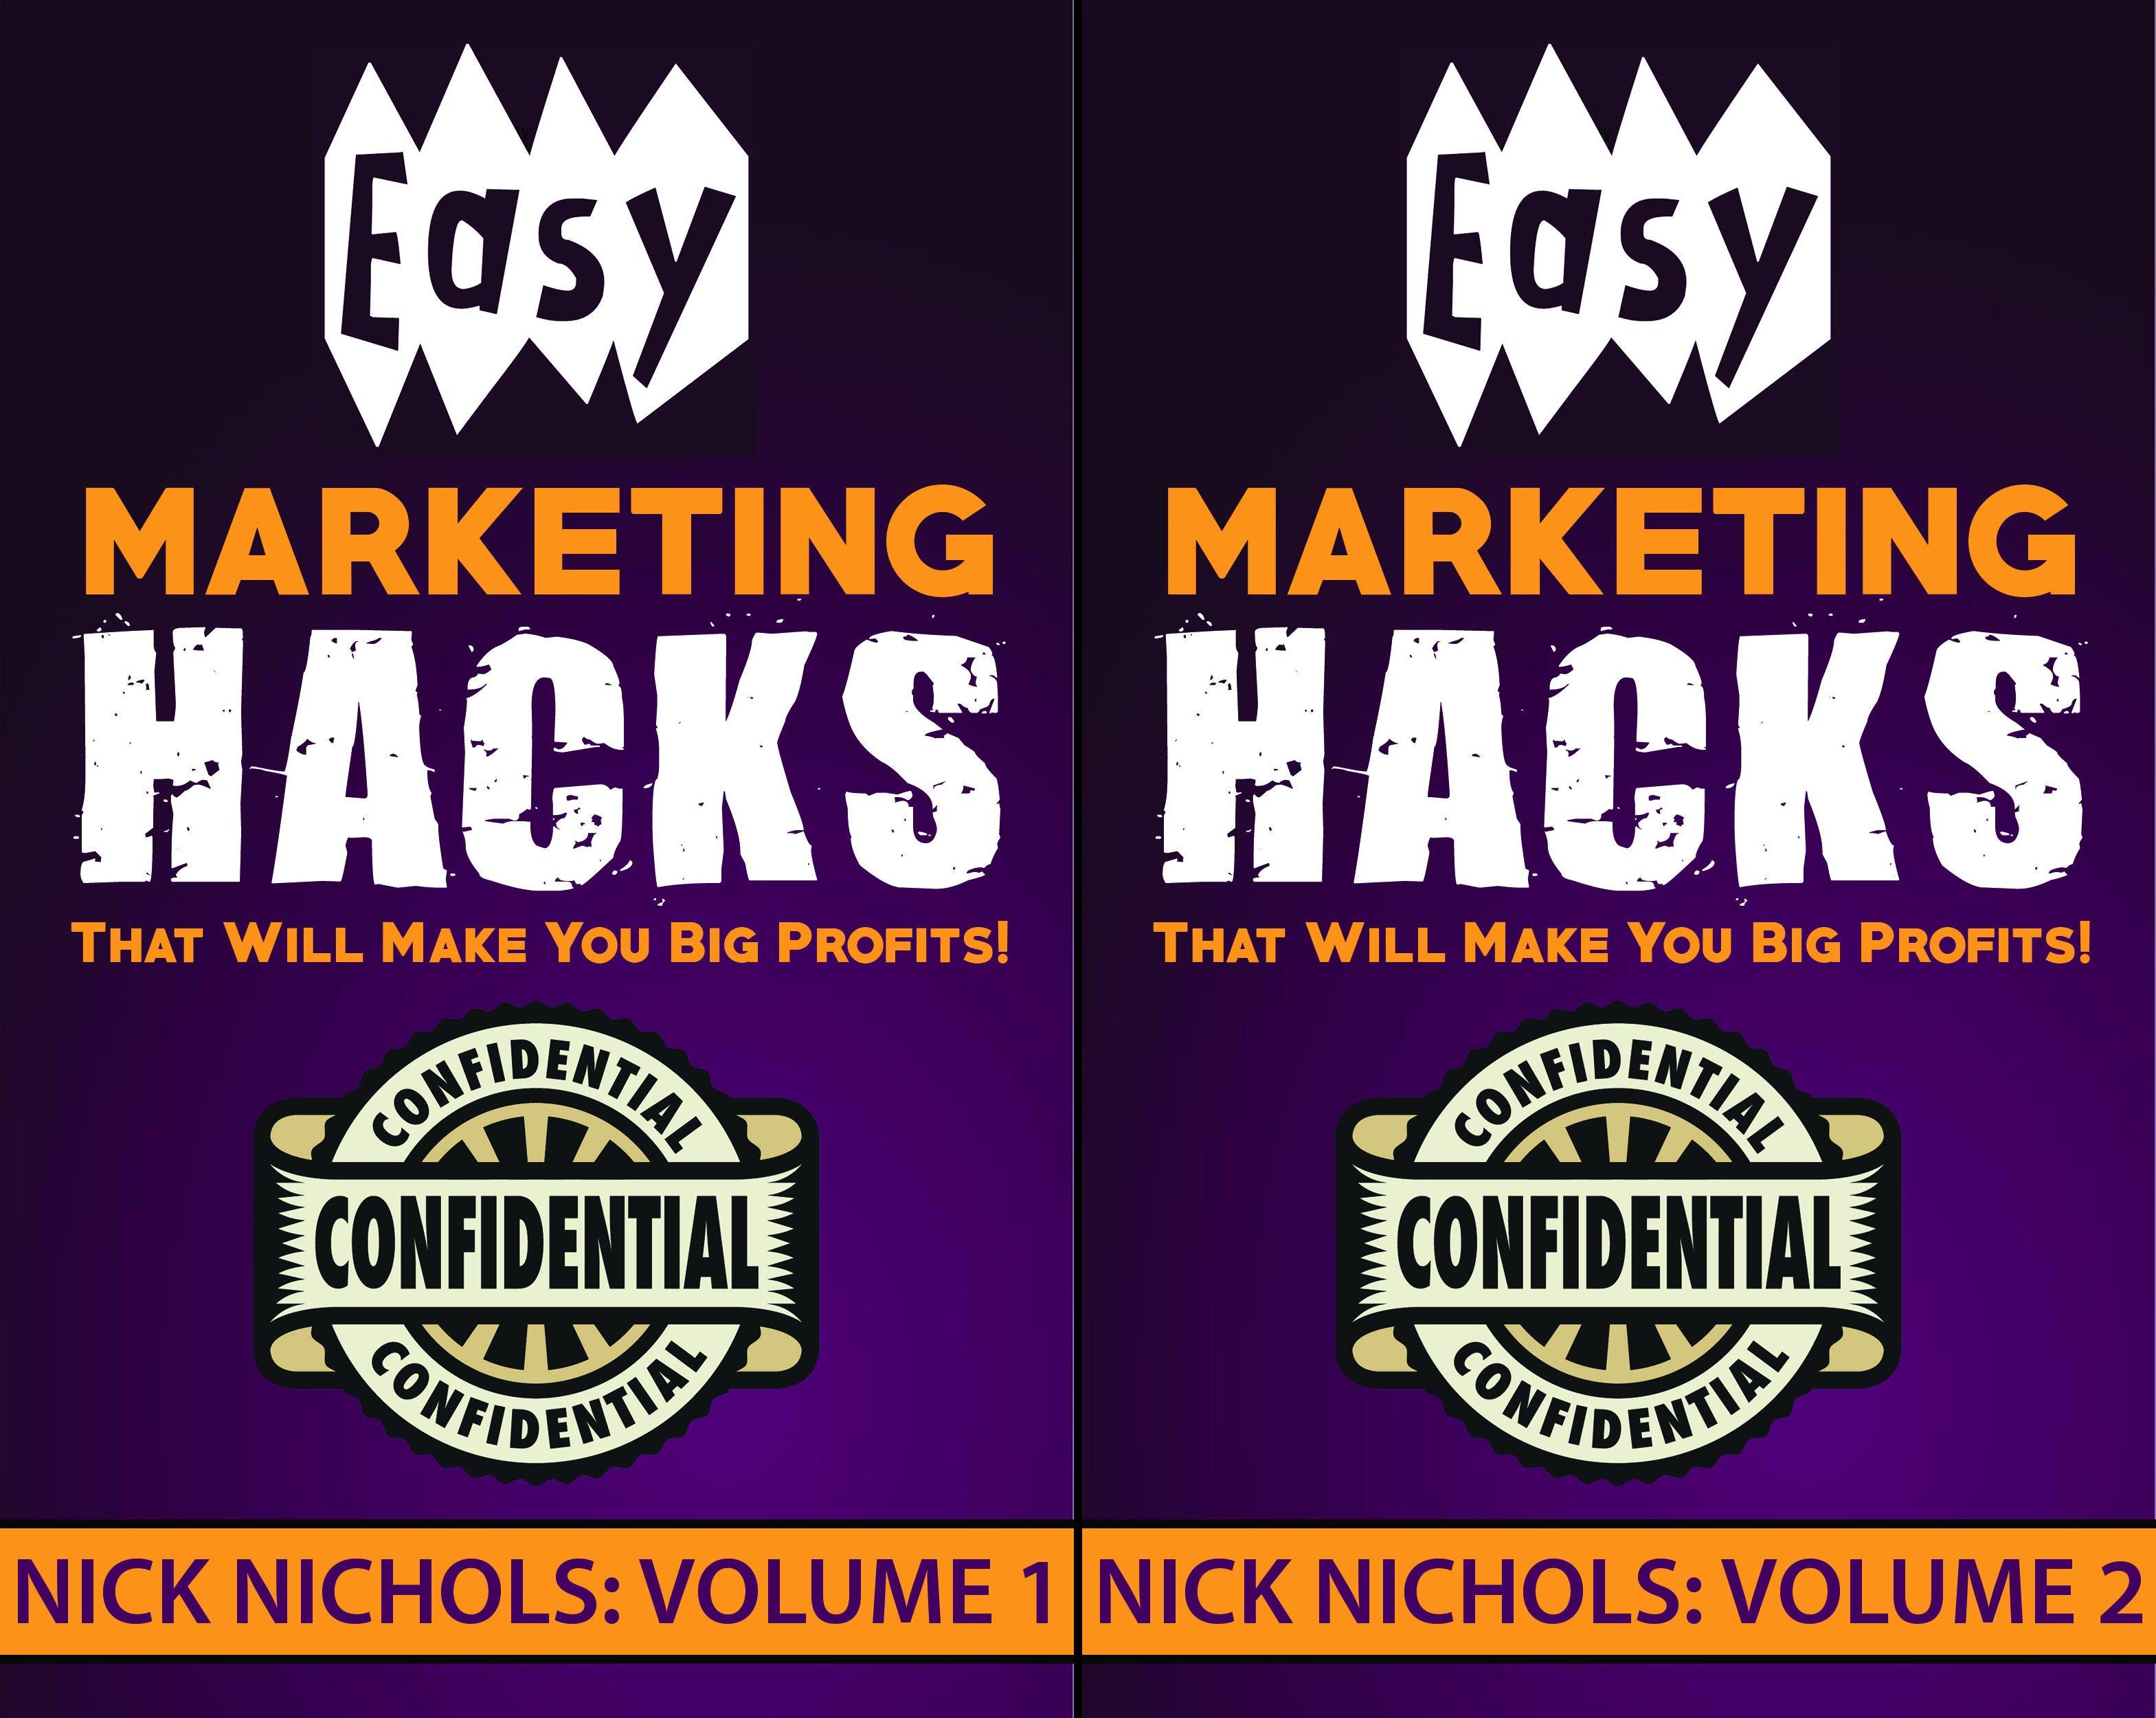 Easy Marketing Hacks (2 Book Series)